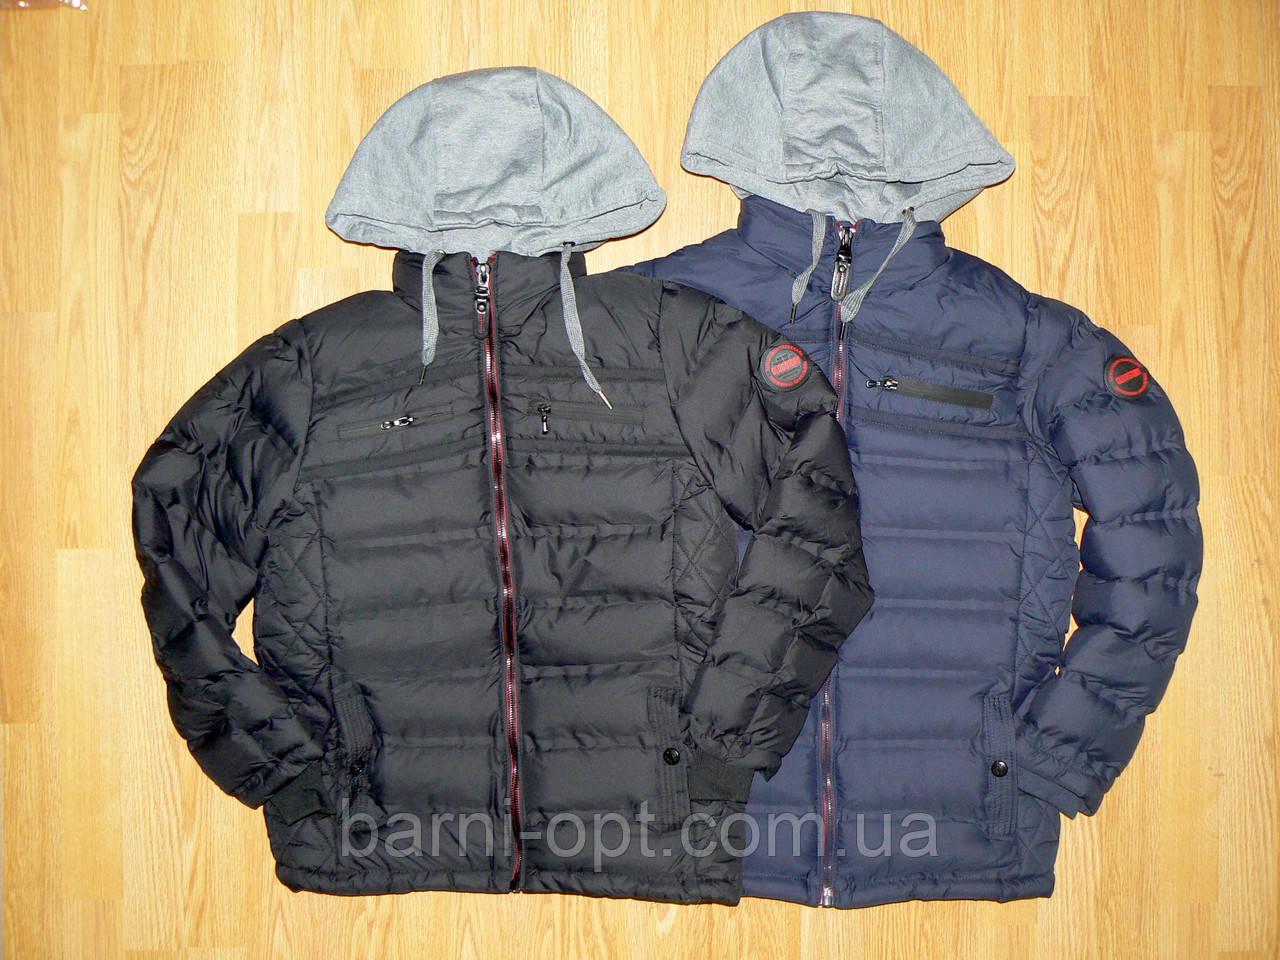 Куртки зимние на мальчика оптом, Glo-story, 134/140-170 рр